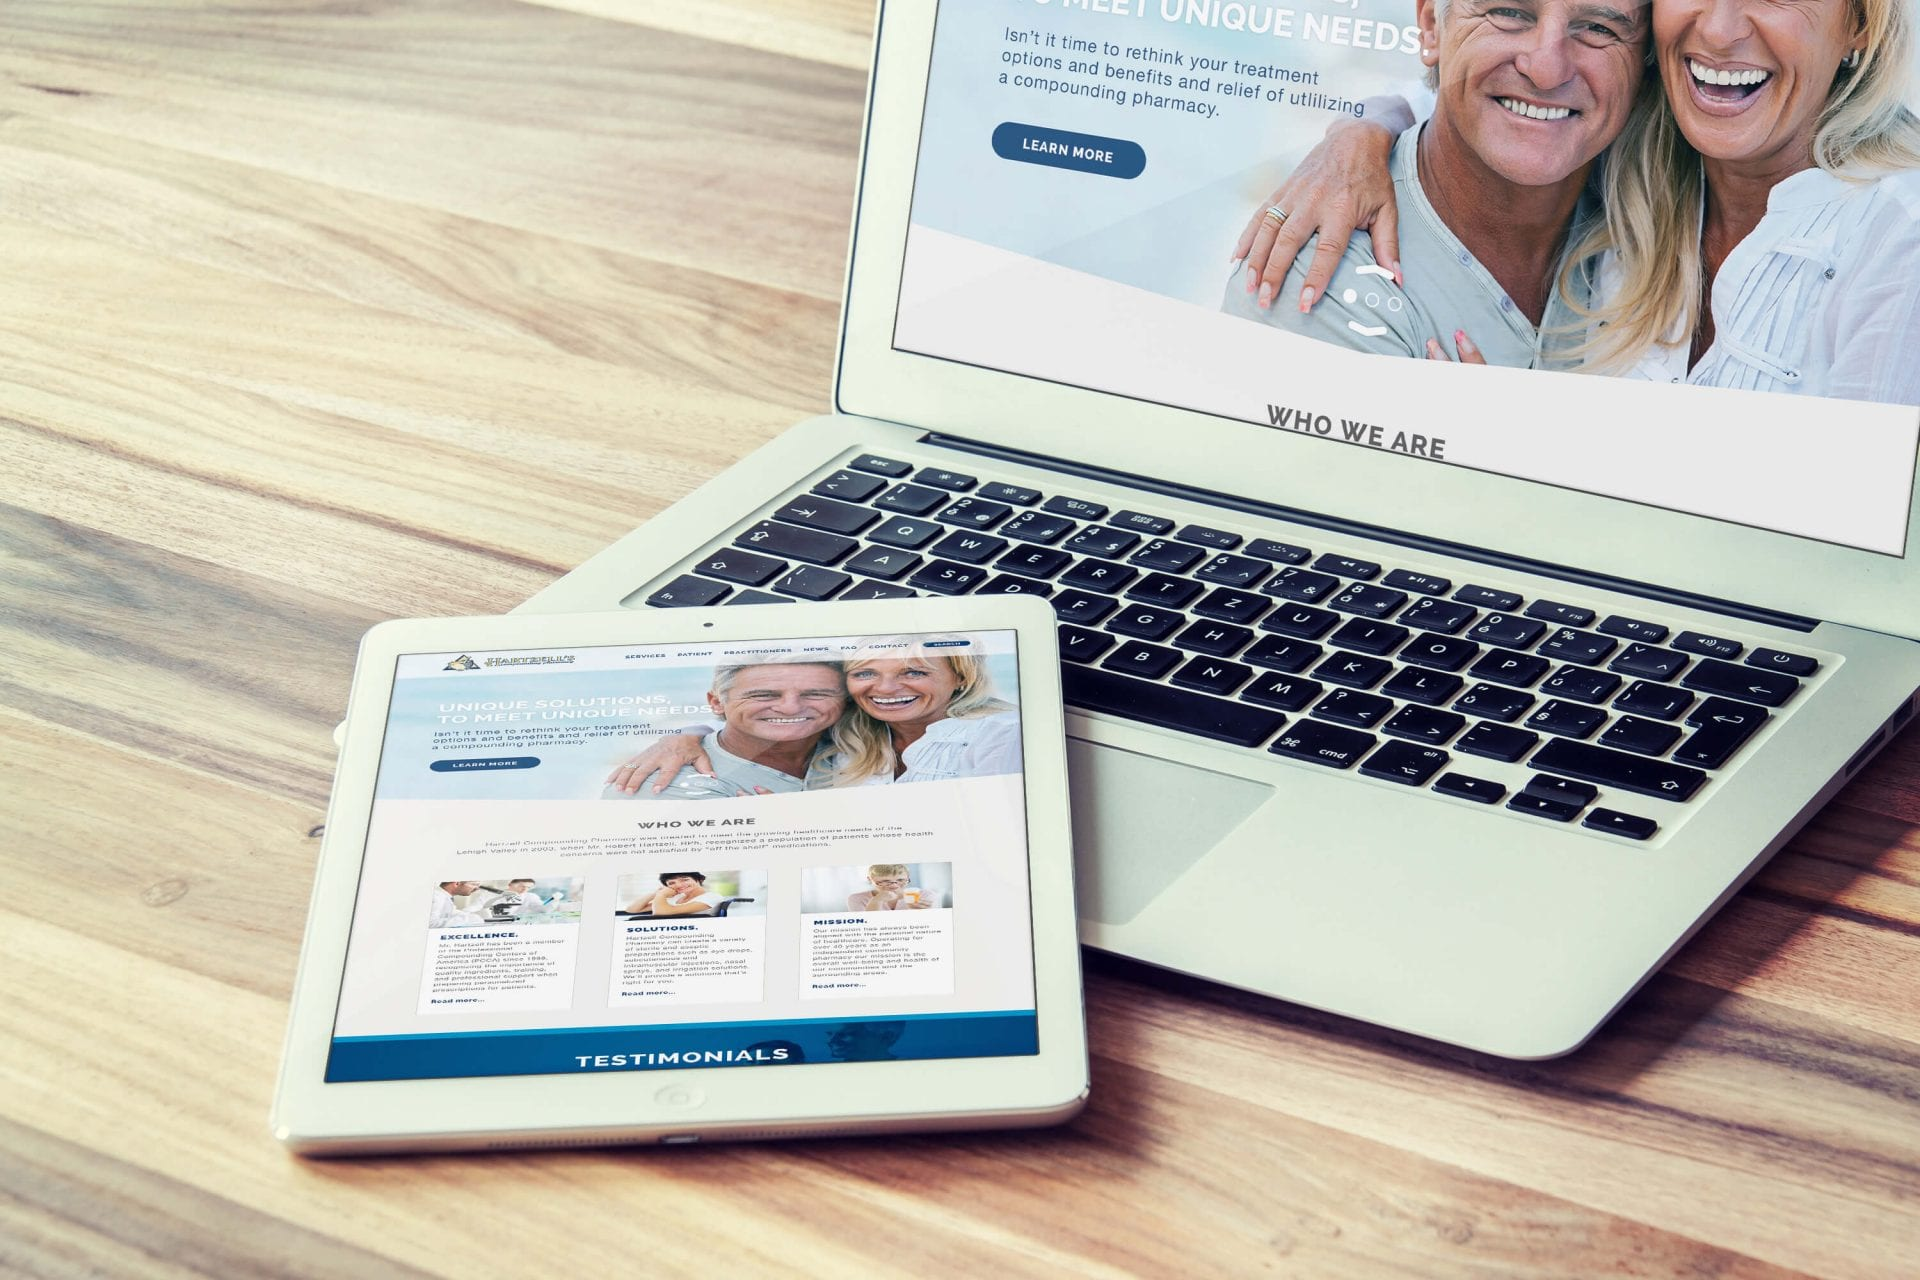 Hartzel Compounding Pharmacy Responsive Web Design Mockup iPad Macbook